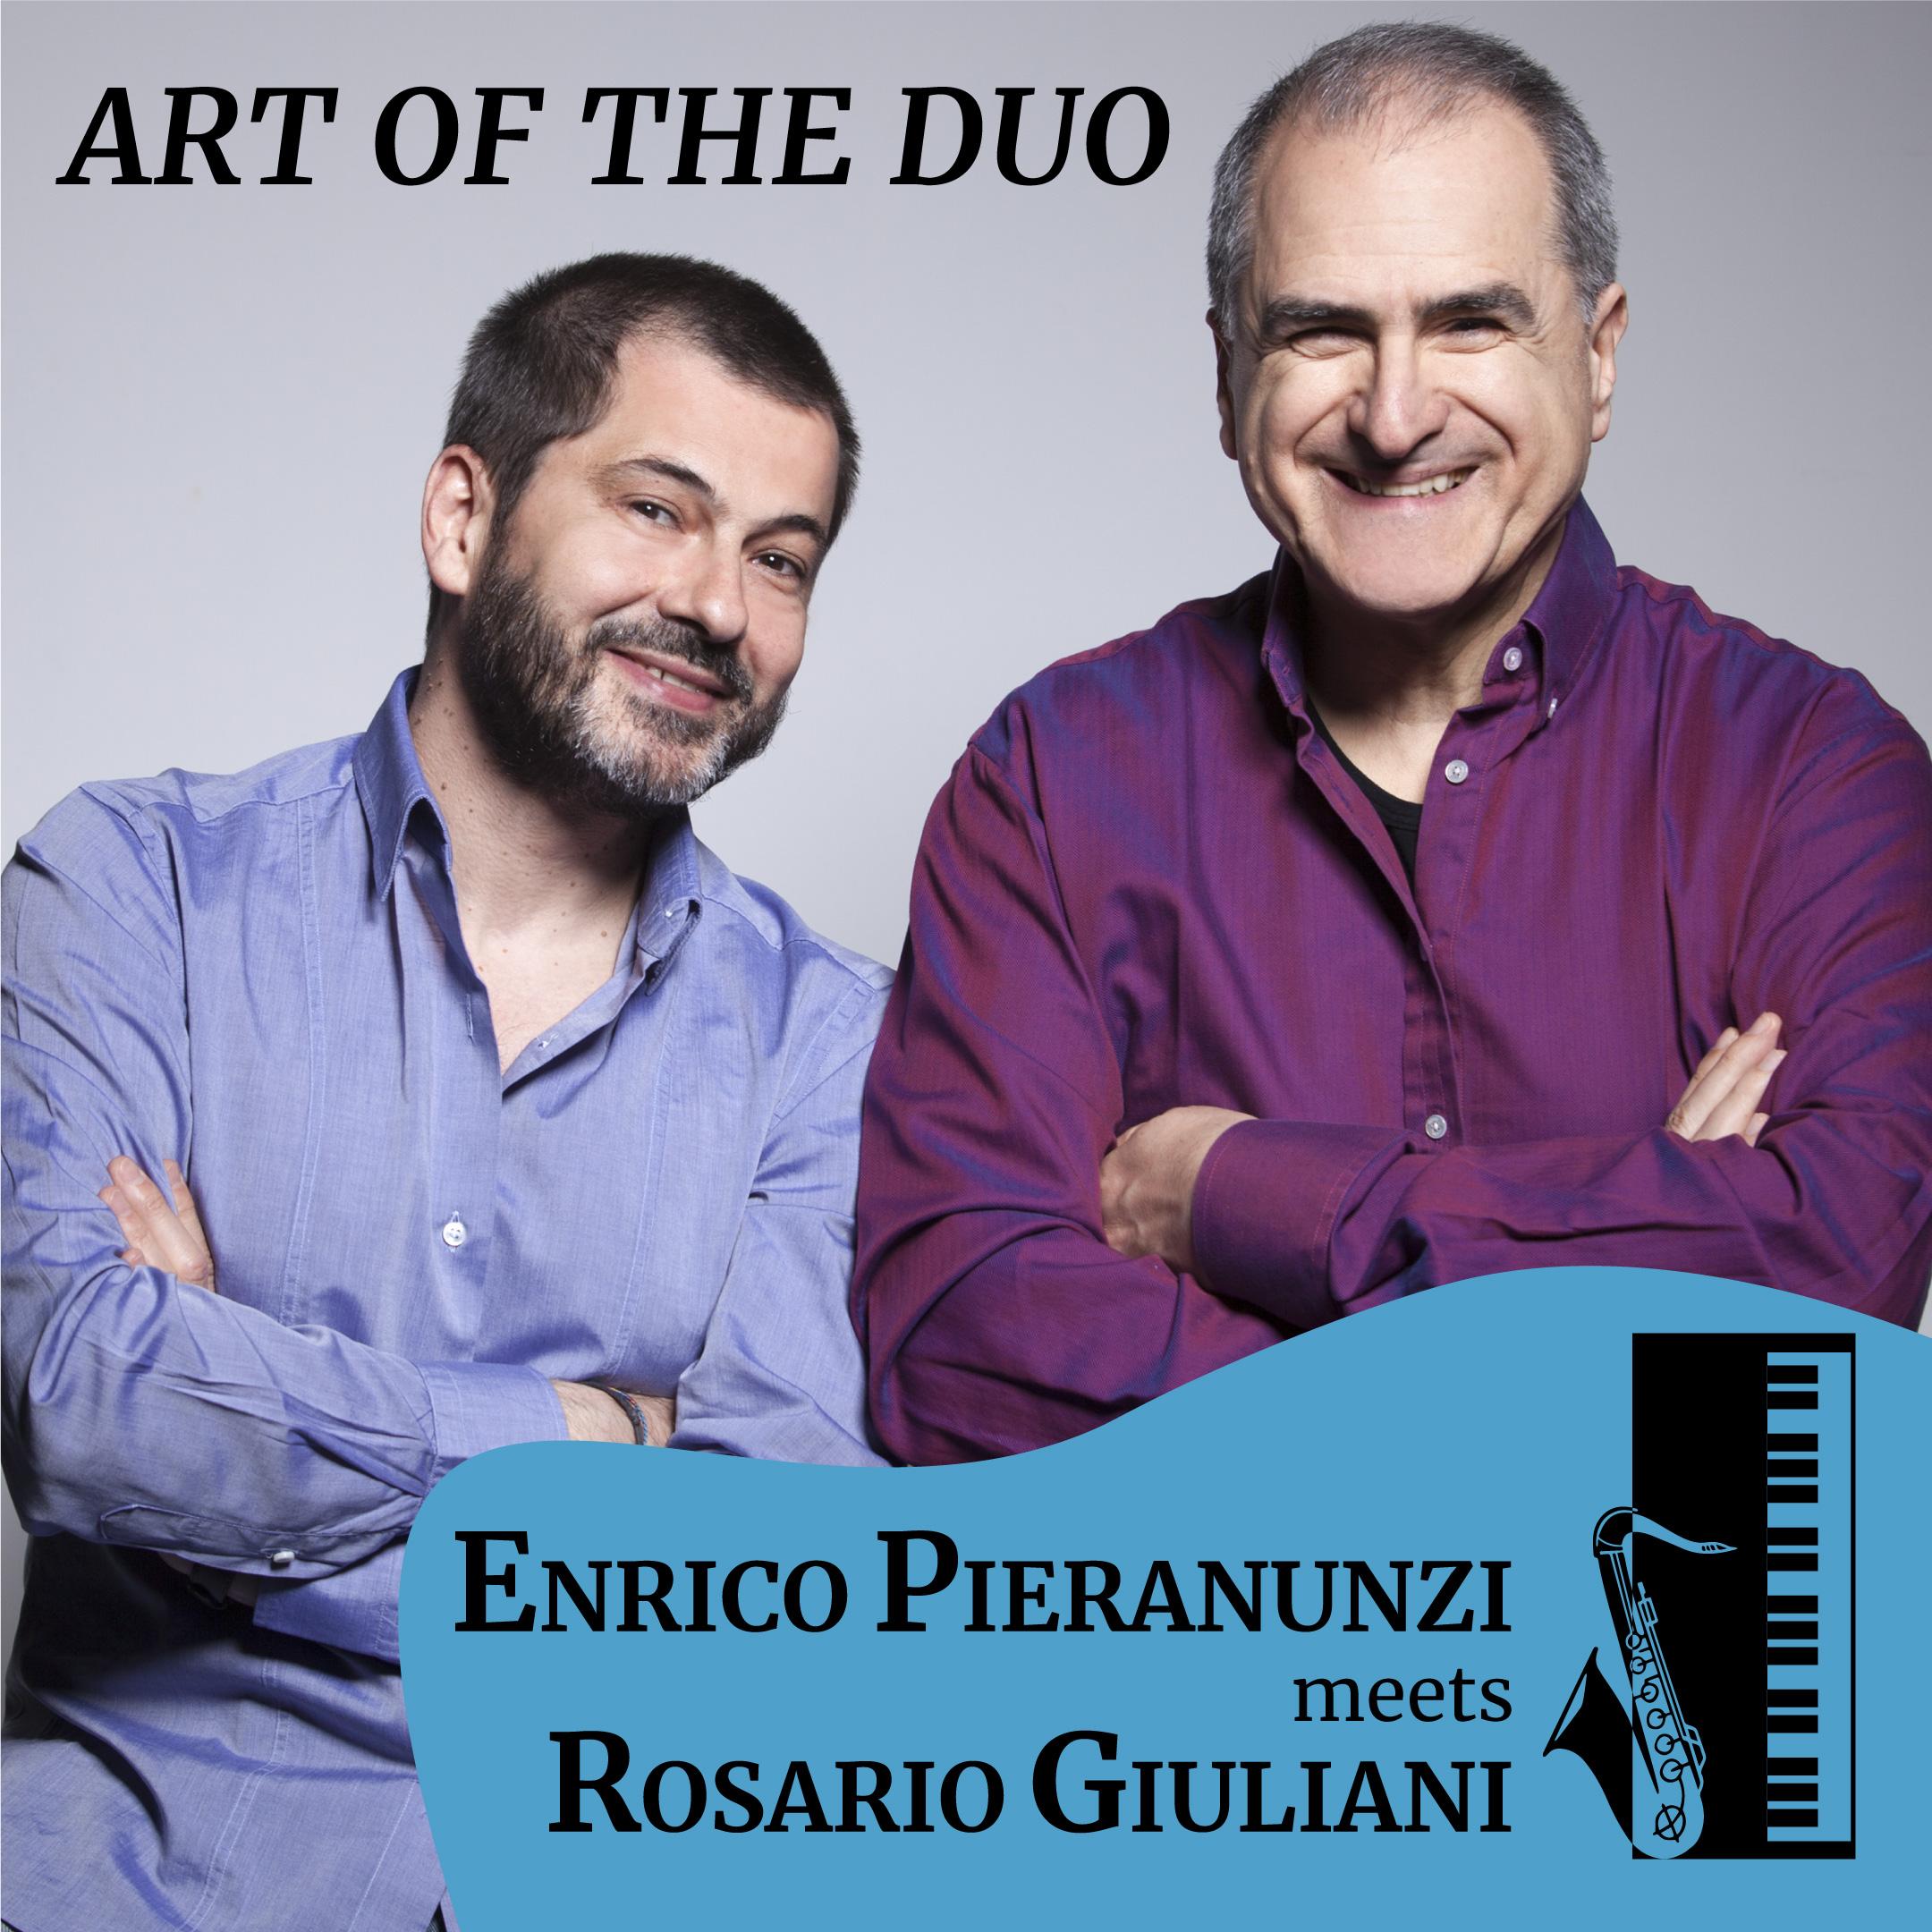 Enrico Pieranunzi e Rosario Giuliani